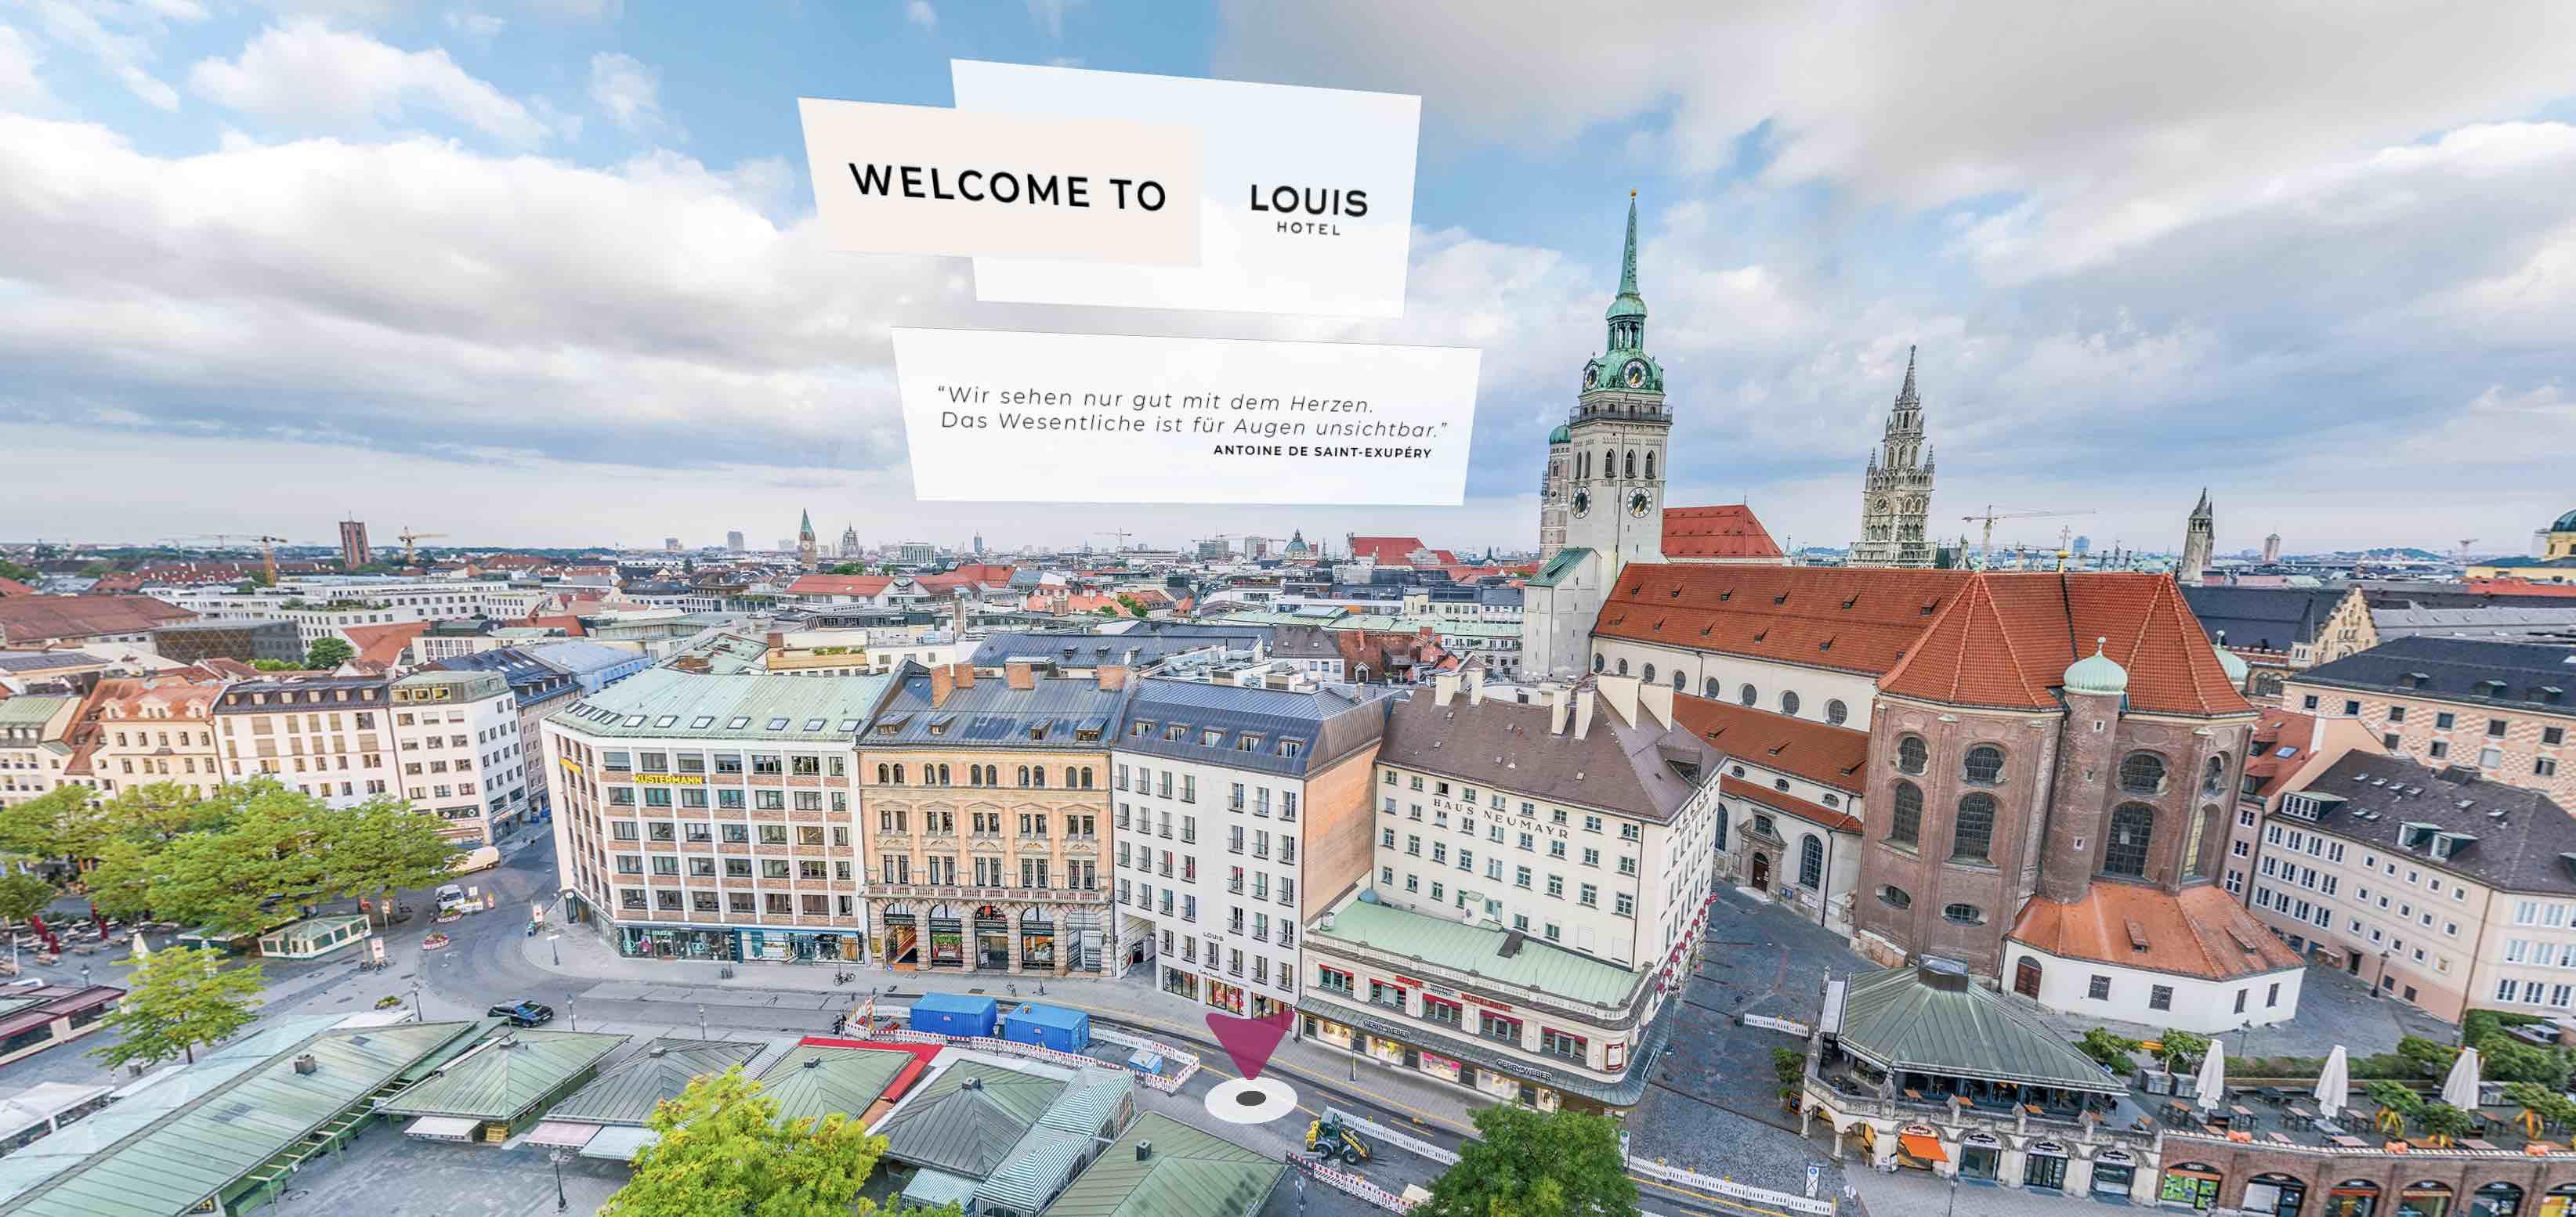 Louis Hotel Muenchen 1 1024x484